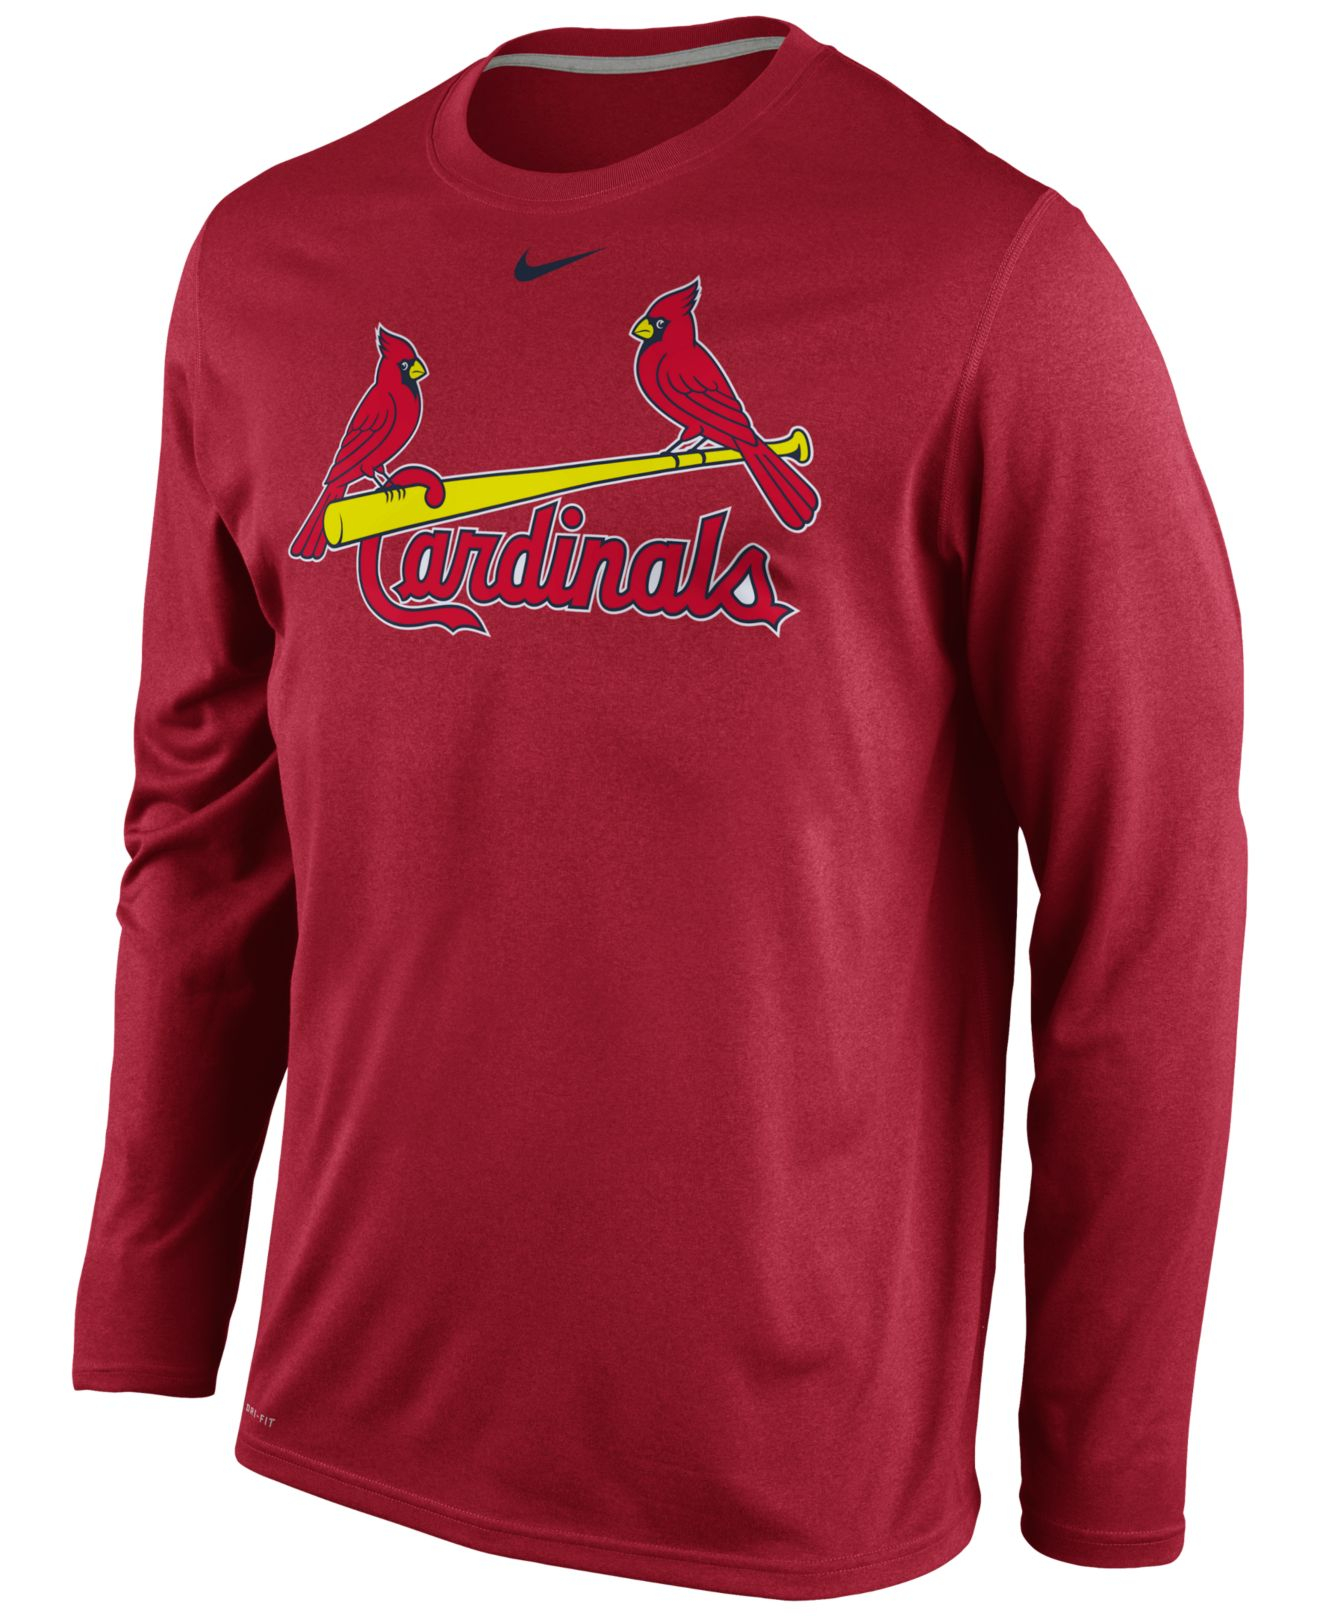 Nike men 39 s long sleeve st louis cardinals legend t shirt for St louis t shirt printing